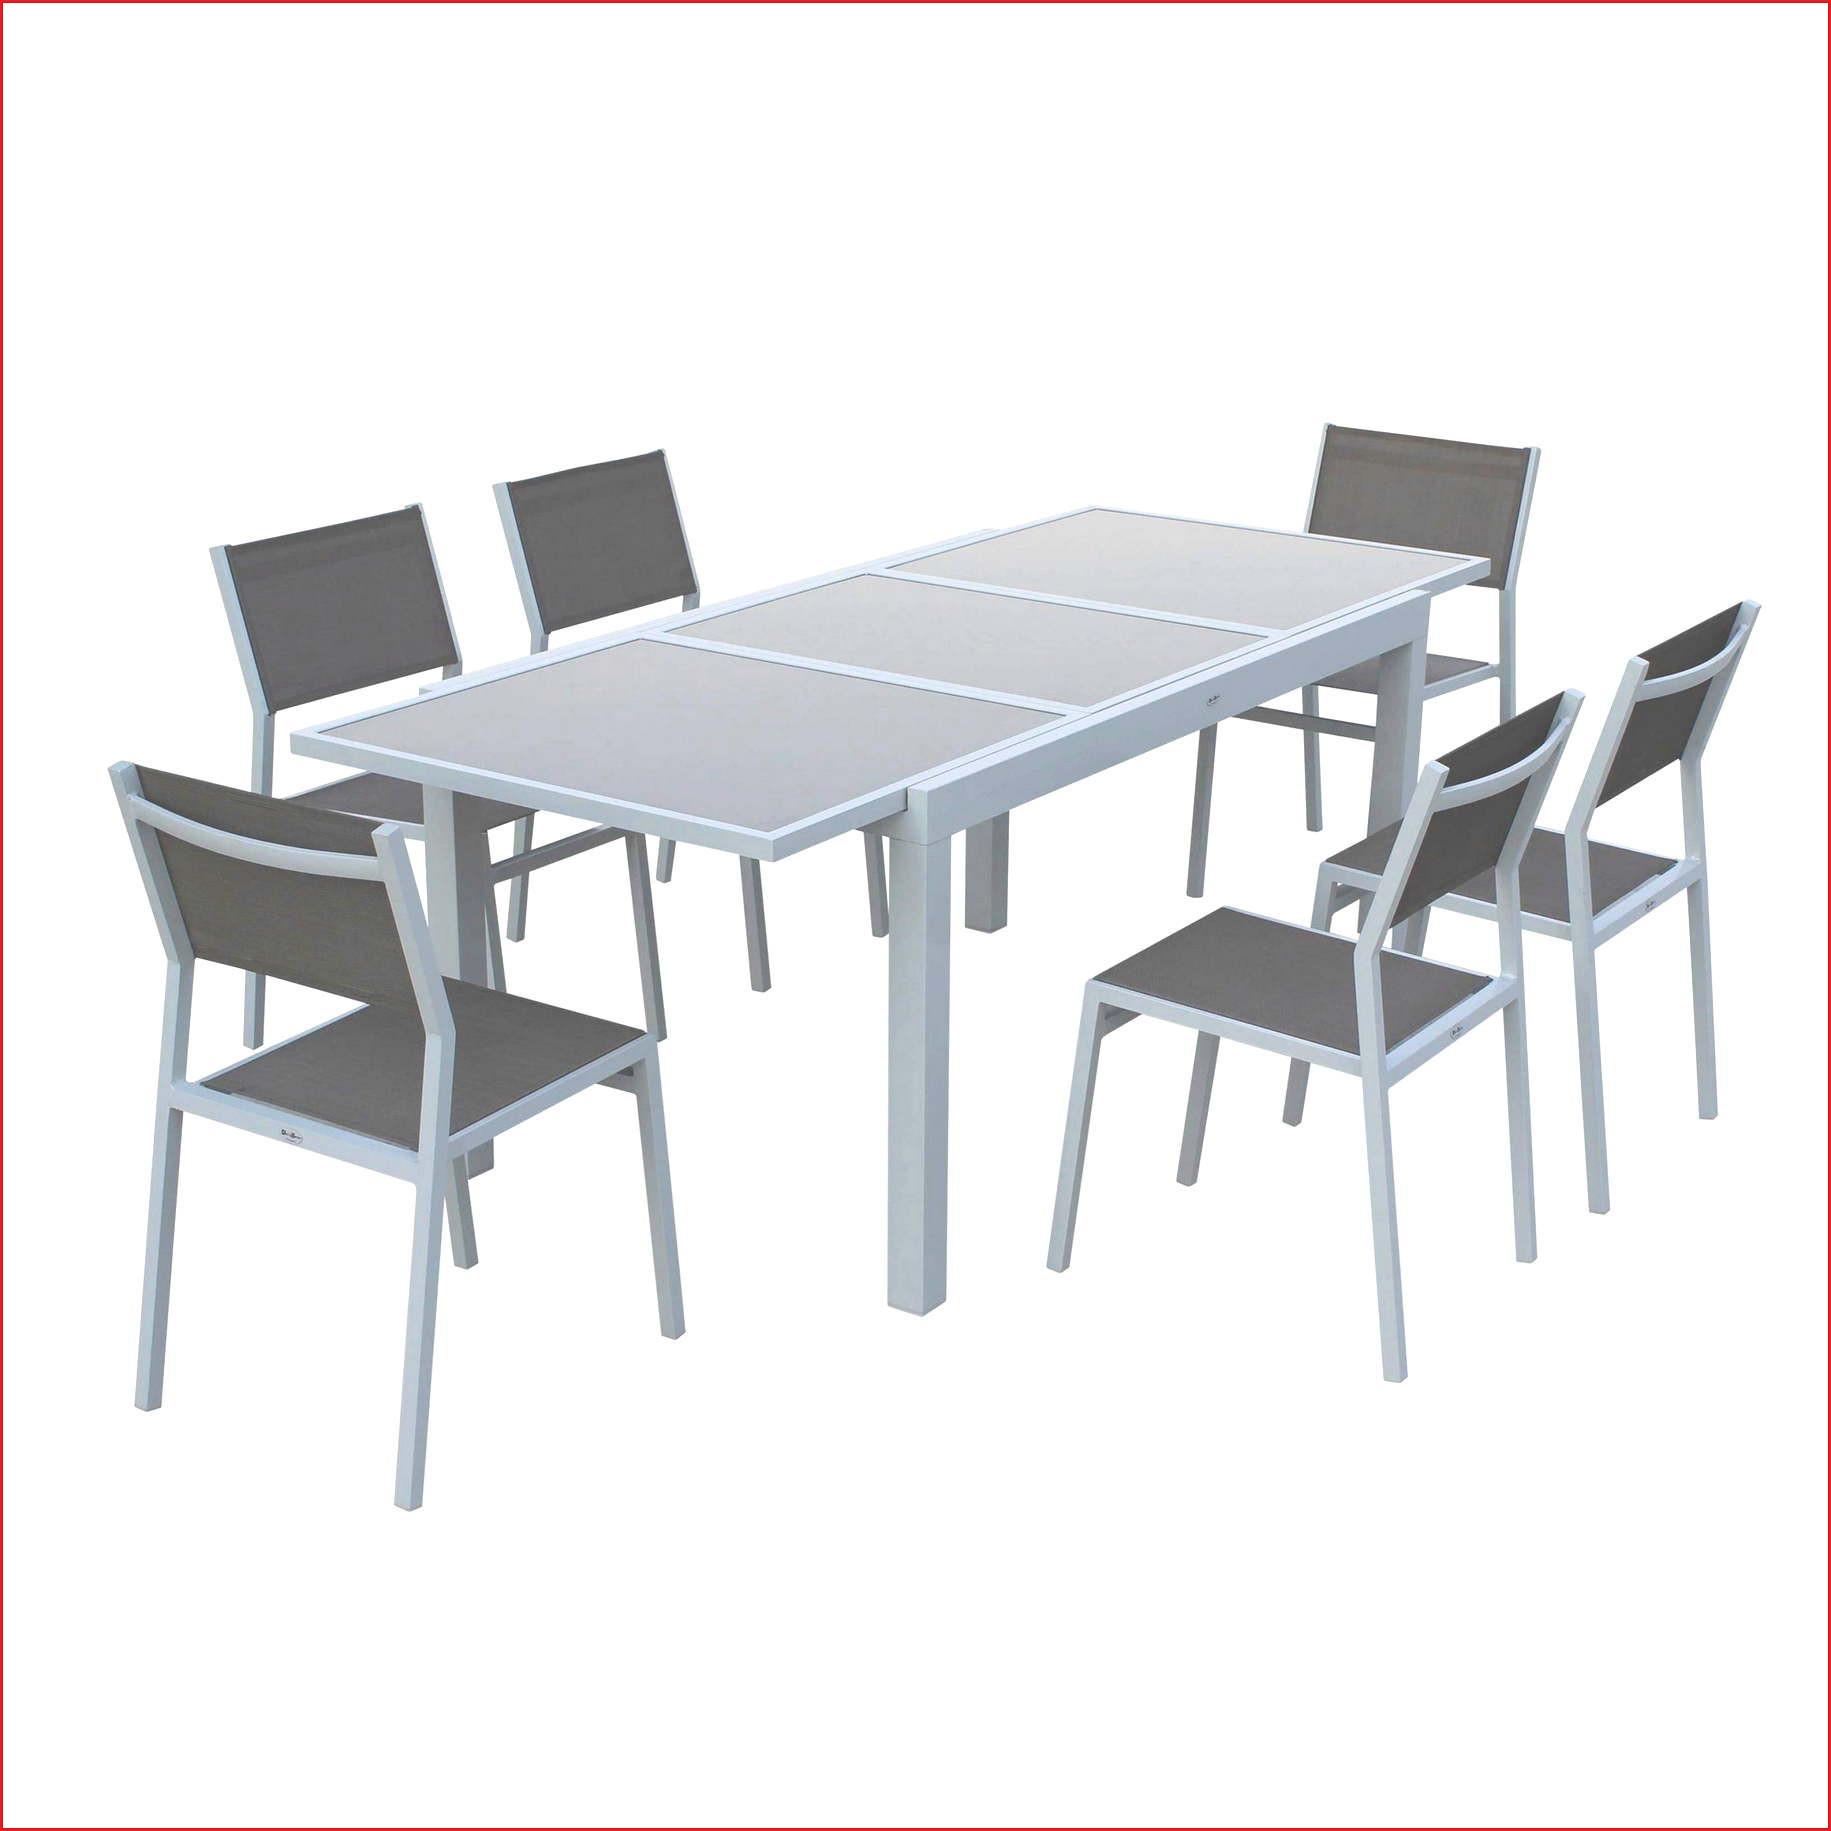 table de jardin enfants mobilier de jardin enfant terrifiant table jardin of table de jardin enfants